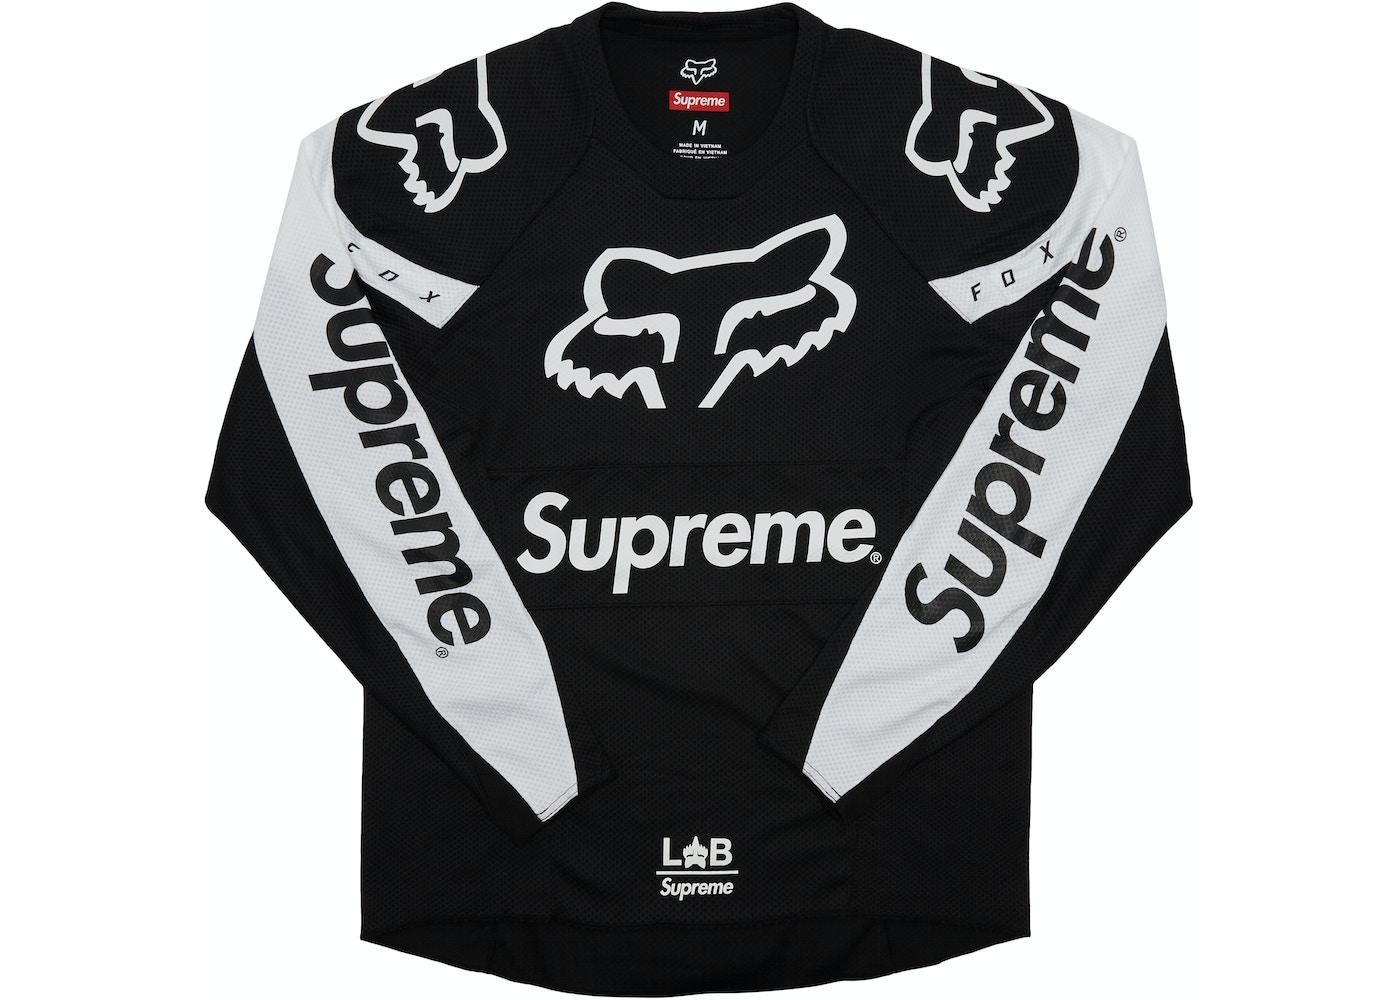 39bcf26f39f Supreme Fox Racing Moto Jersey Top Black - SS18